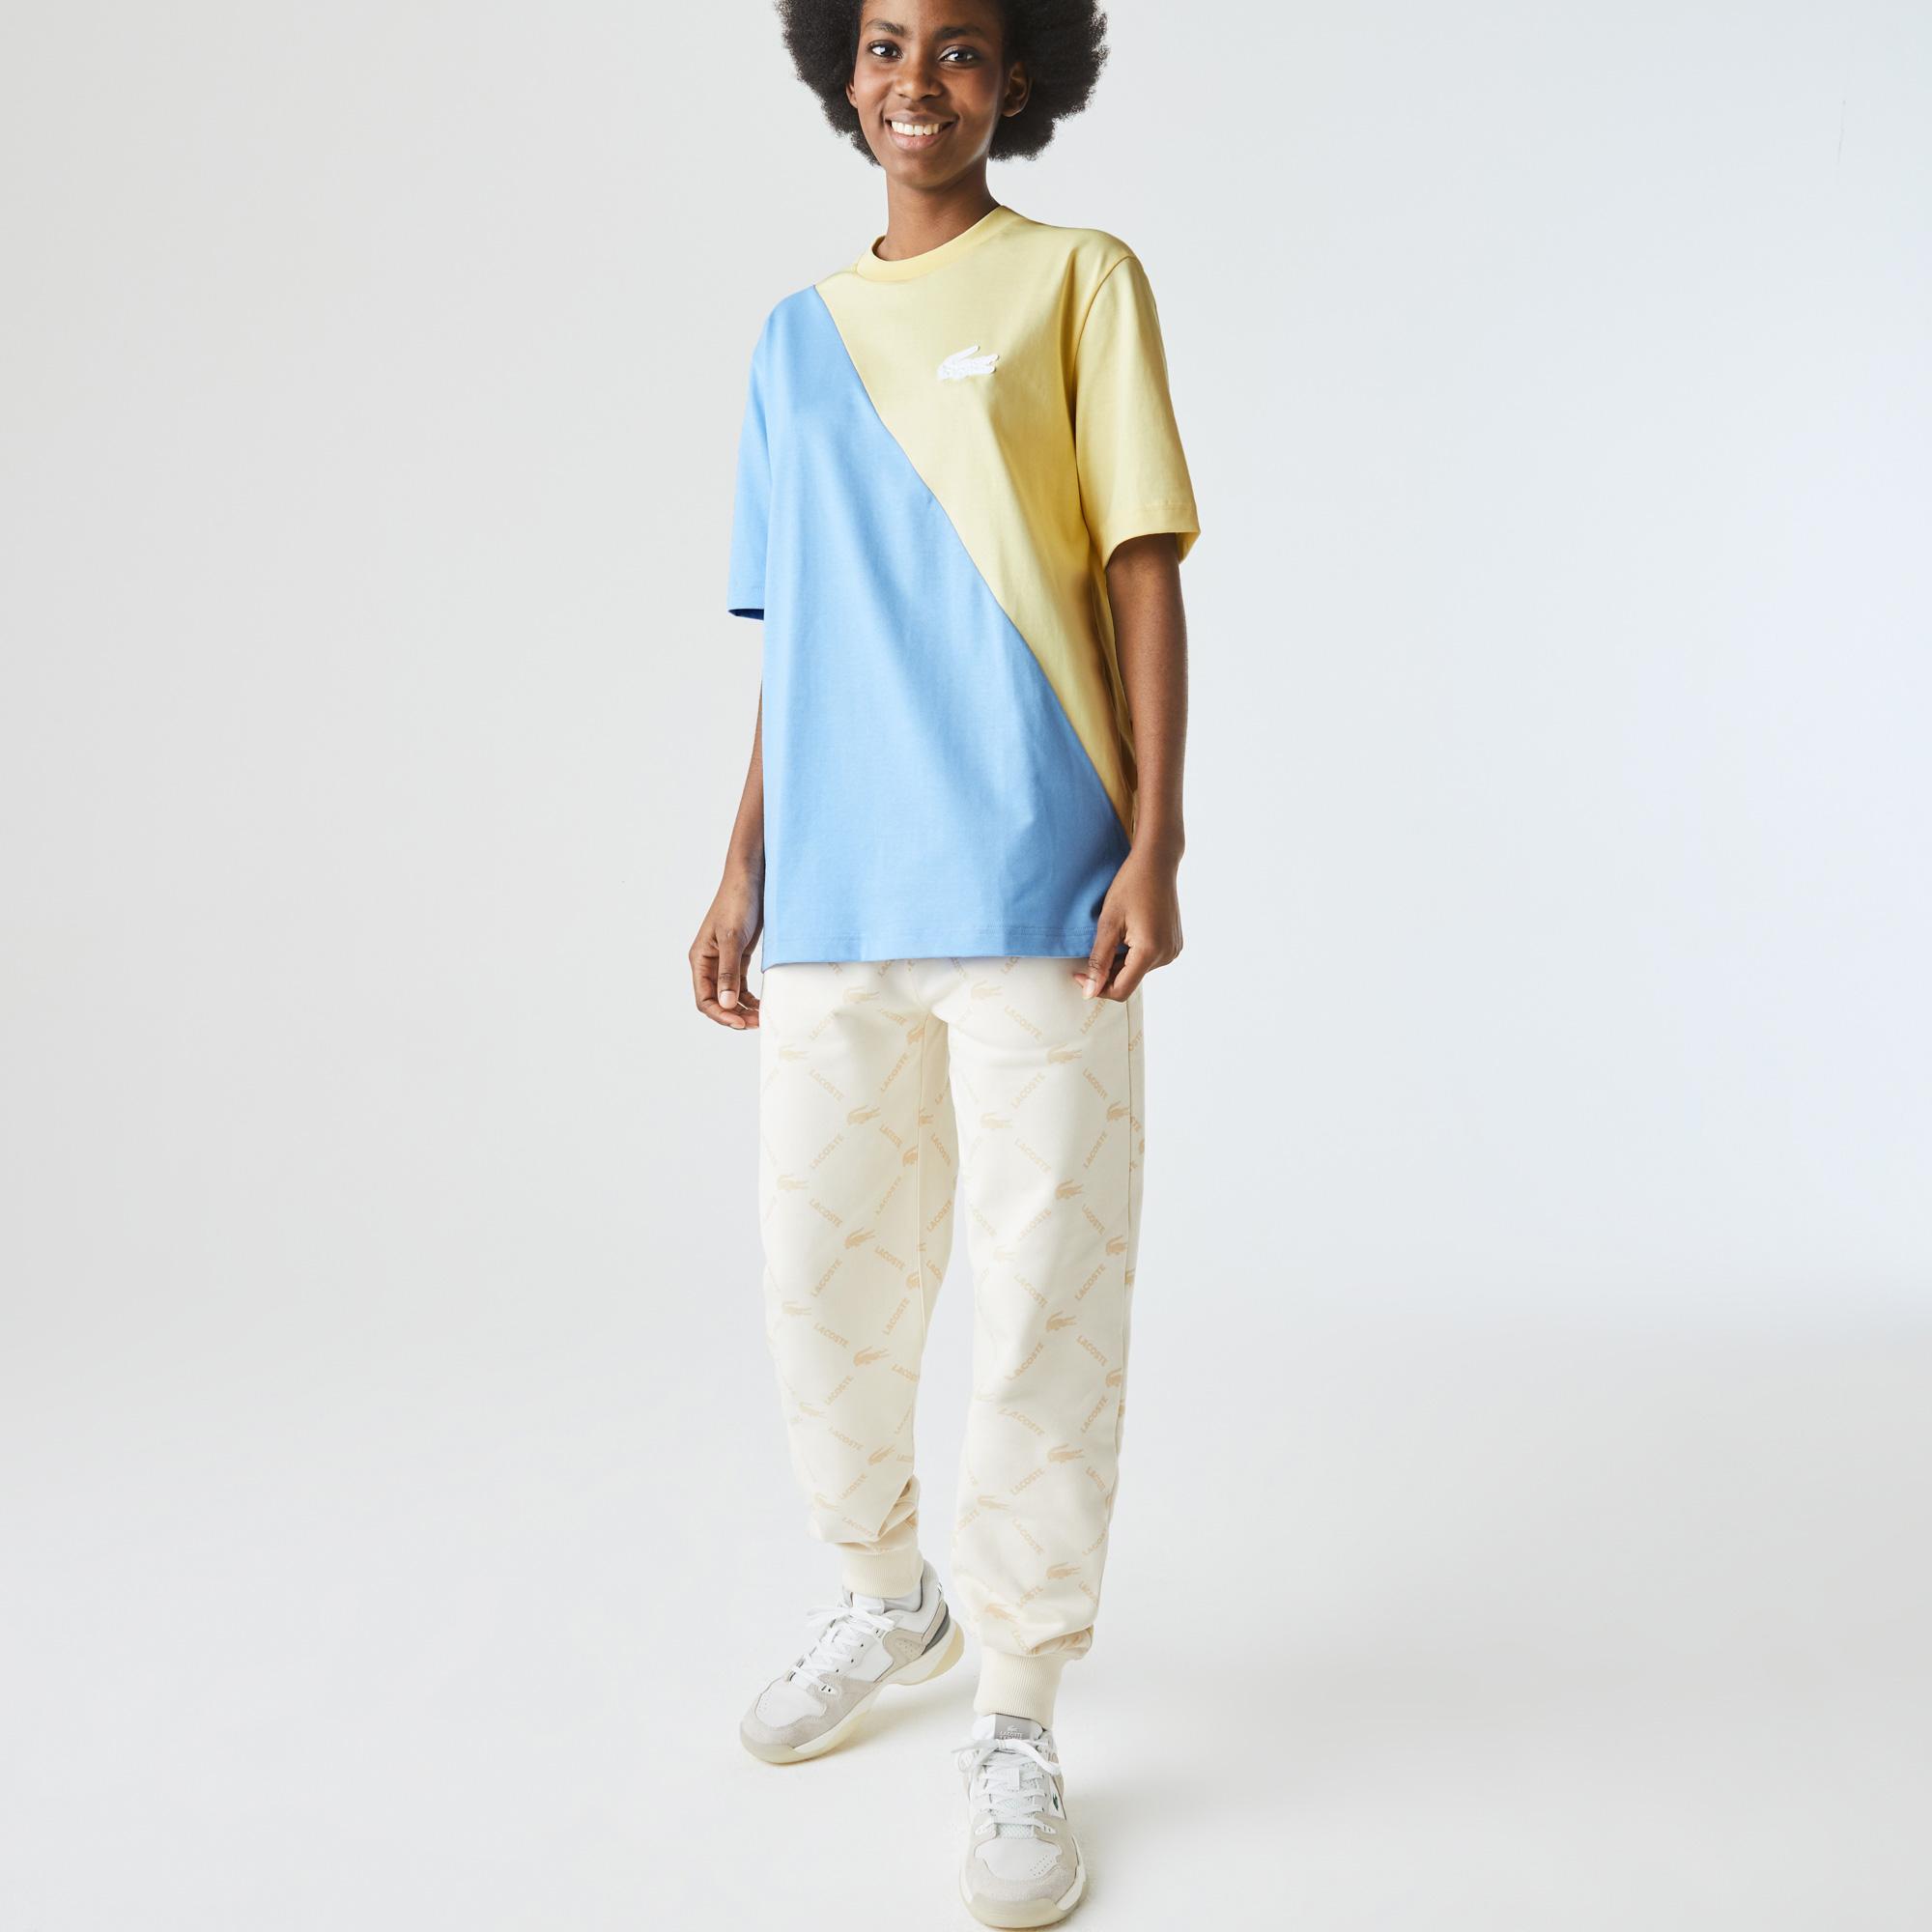 Lacoste L!ve Unisex Loose Fit Bisiklet Yaka Renk Bloklu Sarı - Mavi T-Shirt